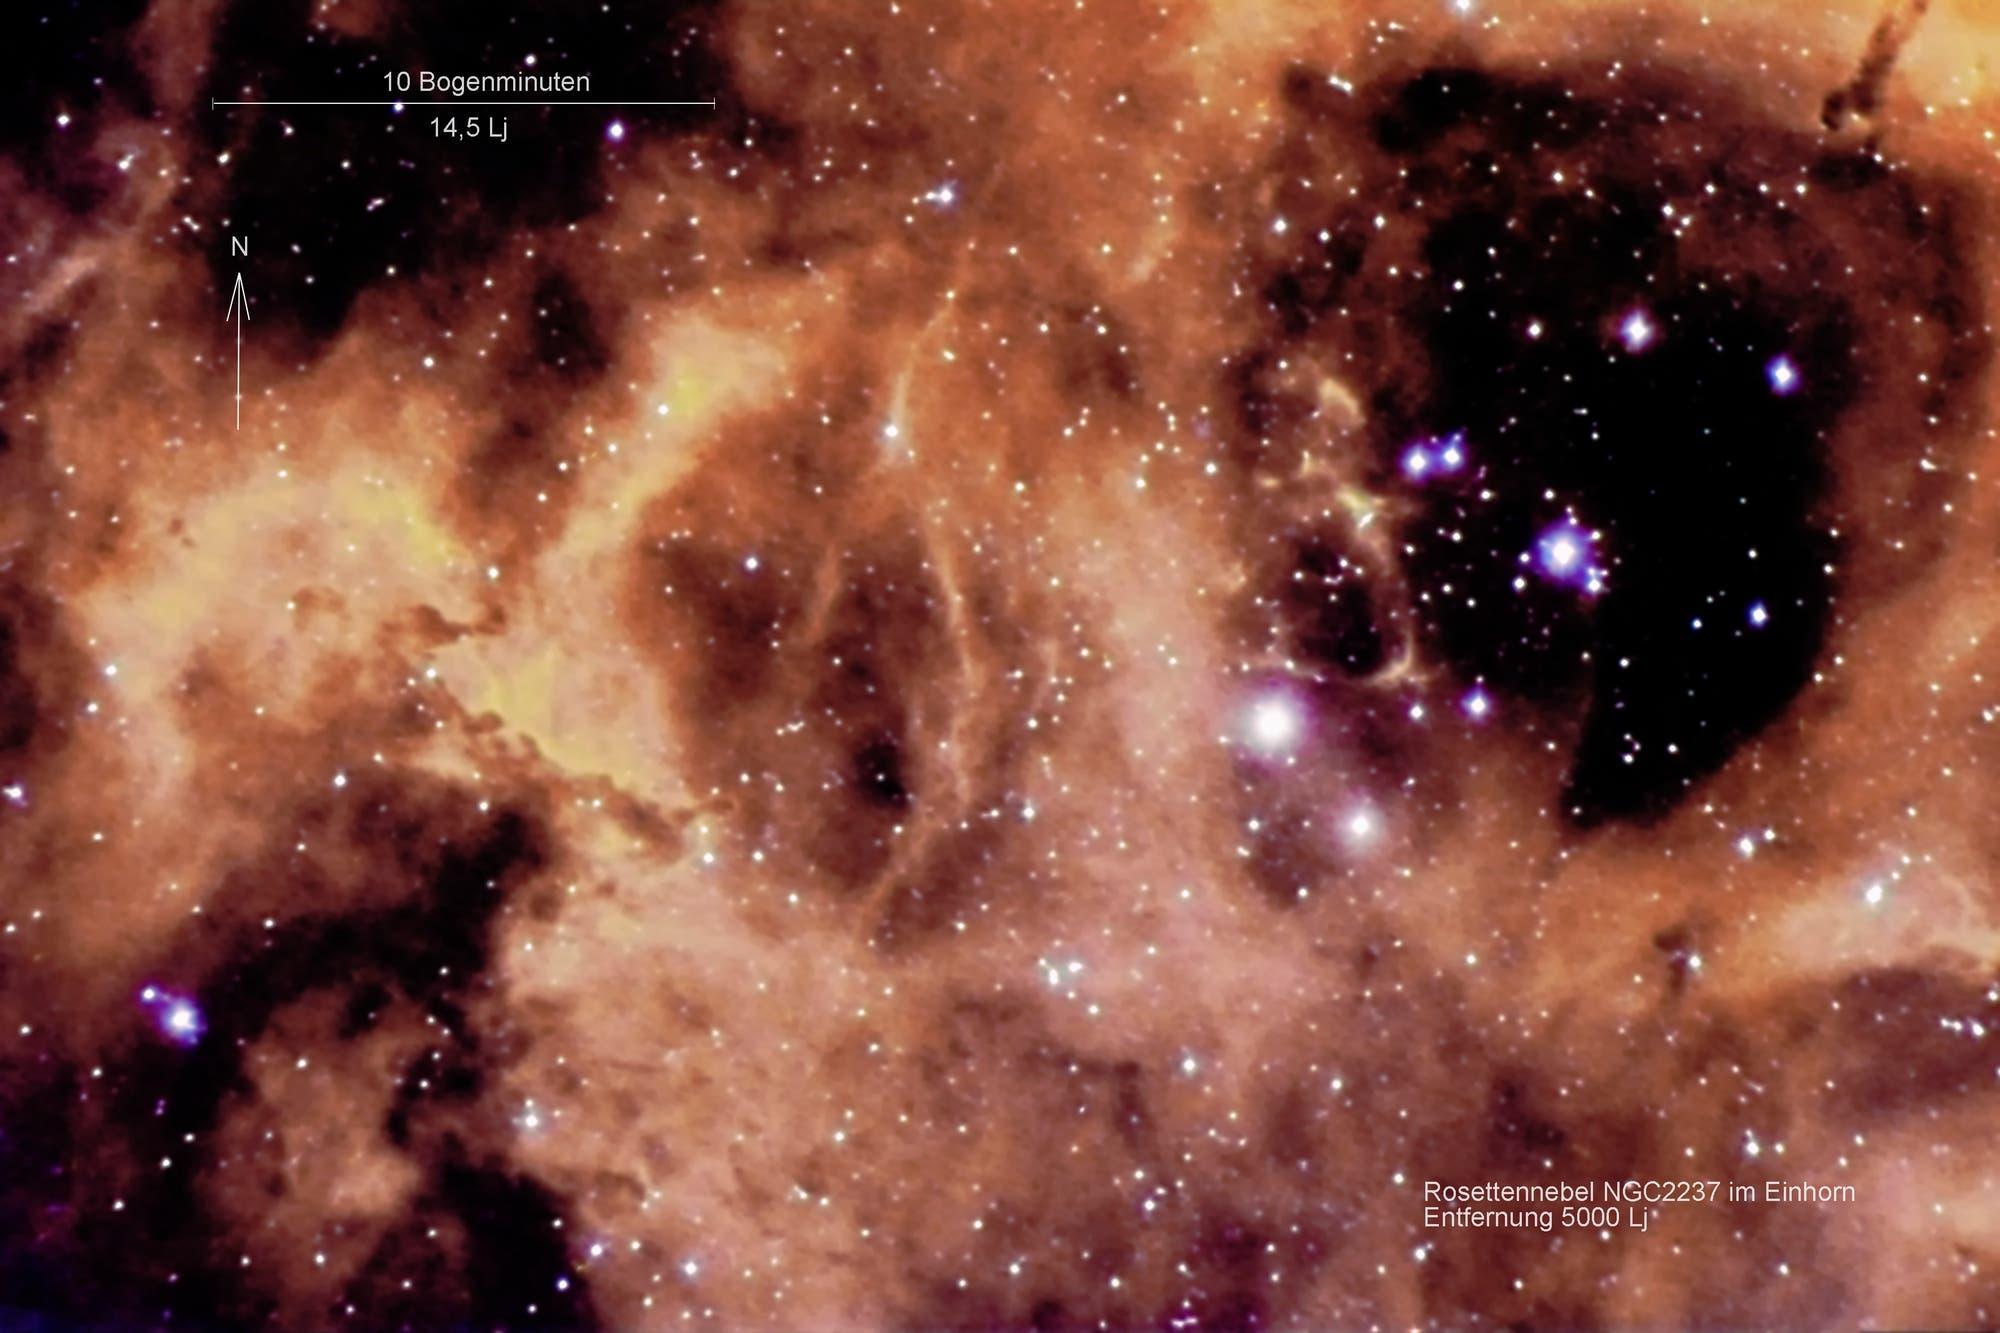 Rosettennebel NGC 2237 mit offenem Sternhaufen NGC 2244